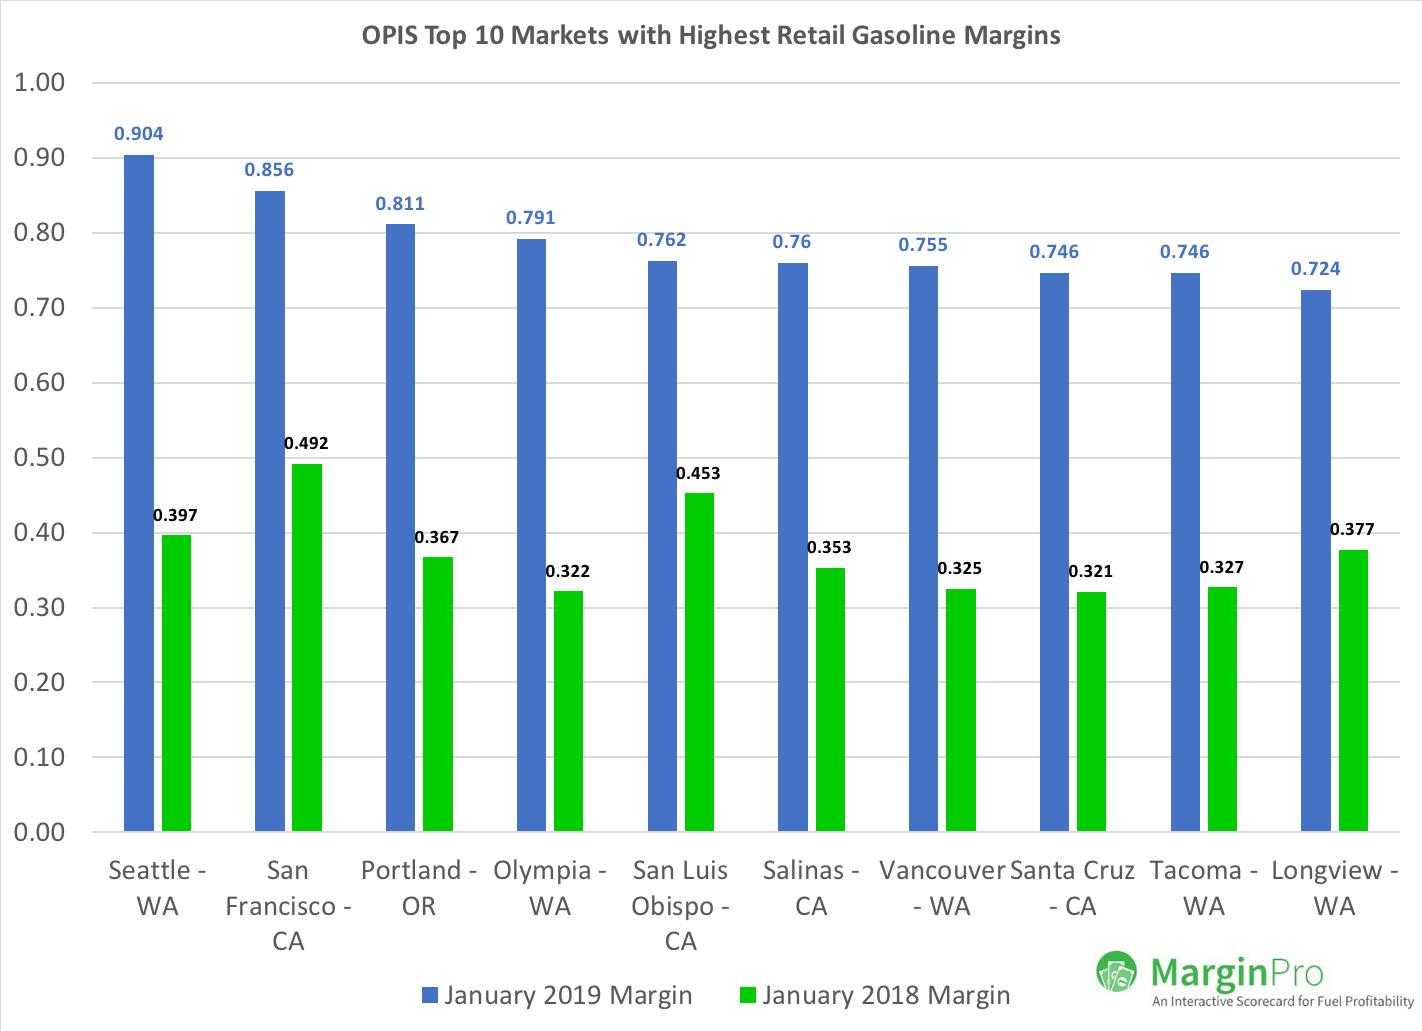 Top 10 Gasoline Markets